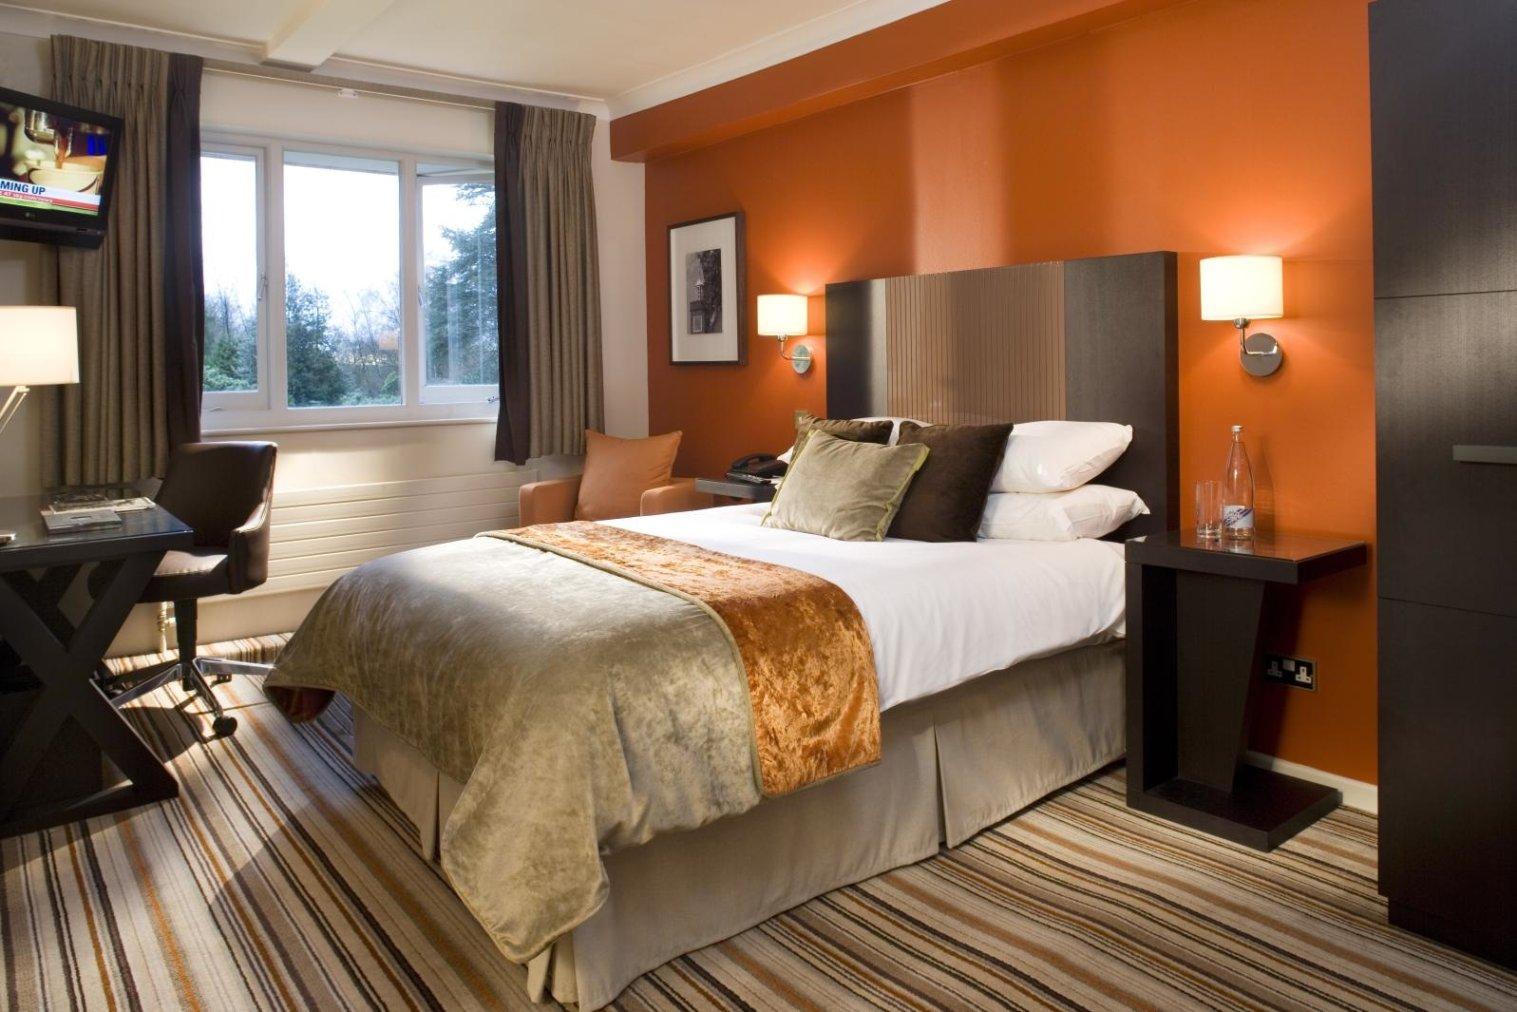 bedroom colors ideas photo - 2